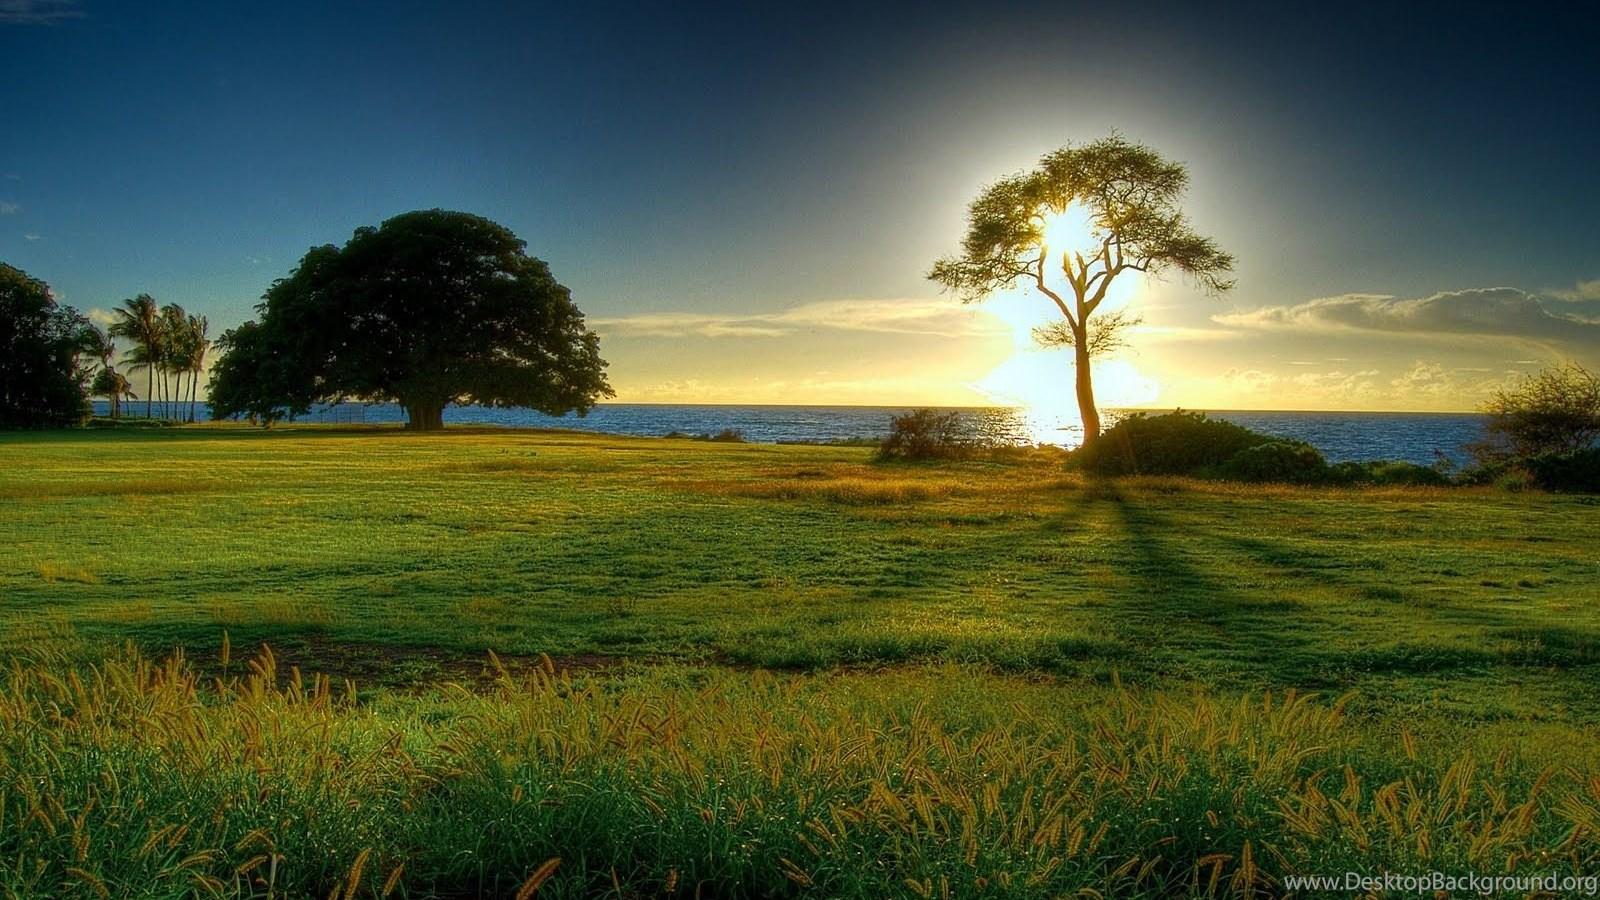 Sfondi desktop gratis sfondi pc windows 7 nature clip - Nature wallpaper free download windows 7 ...